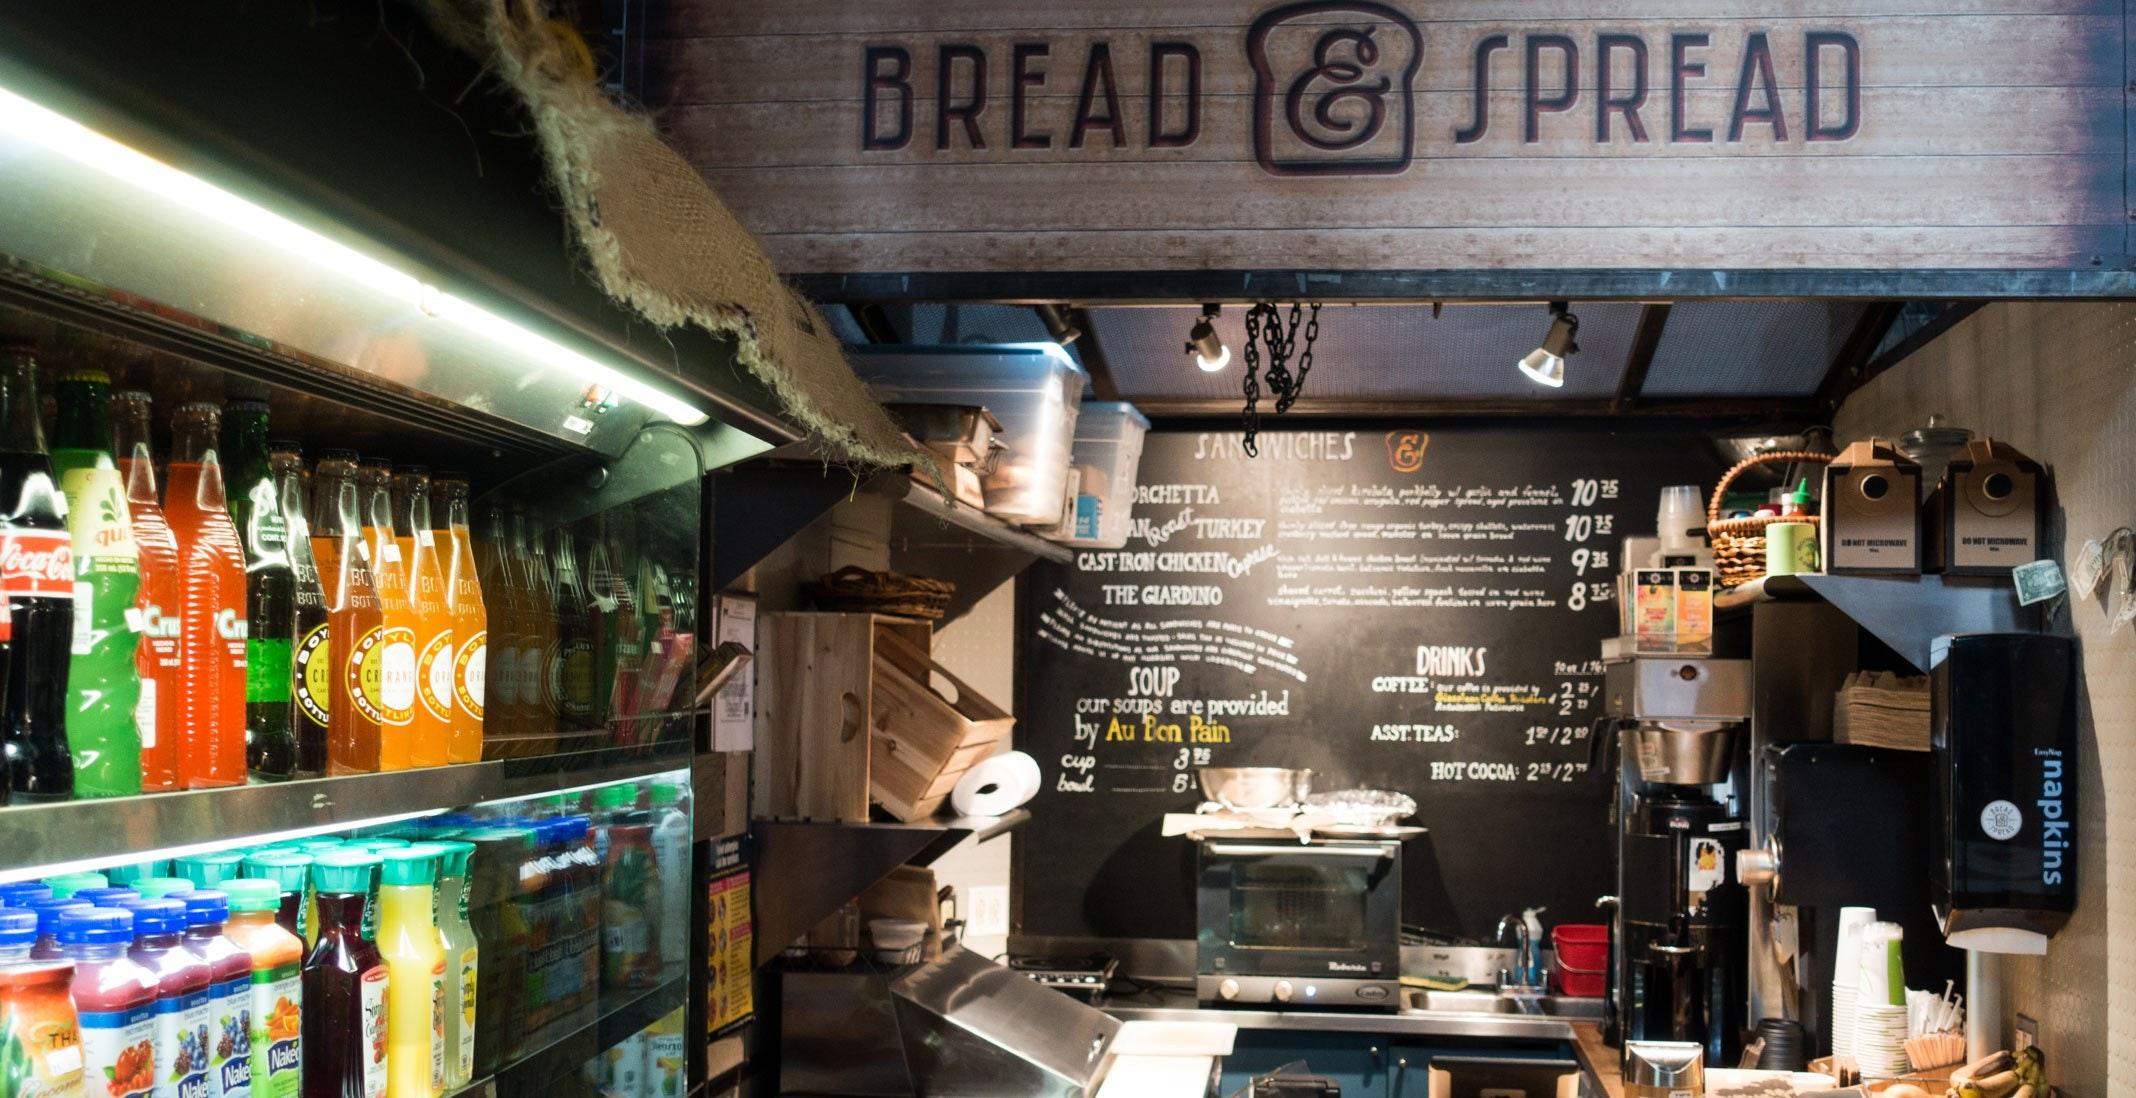 Bread & Spread